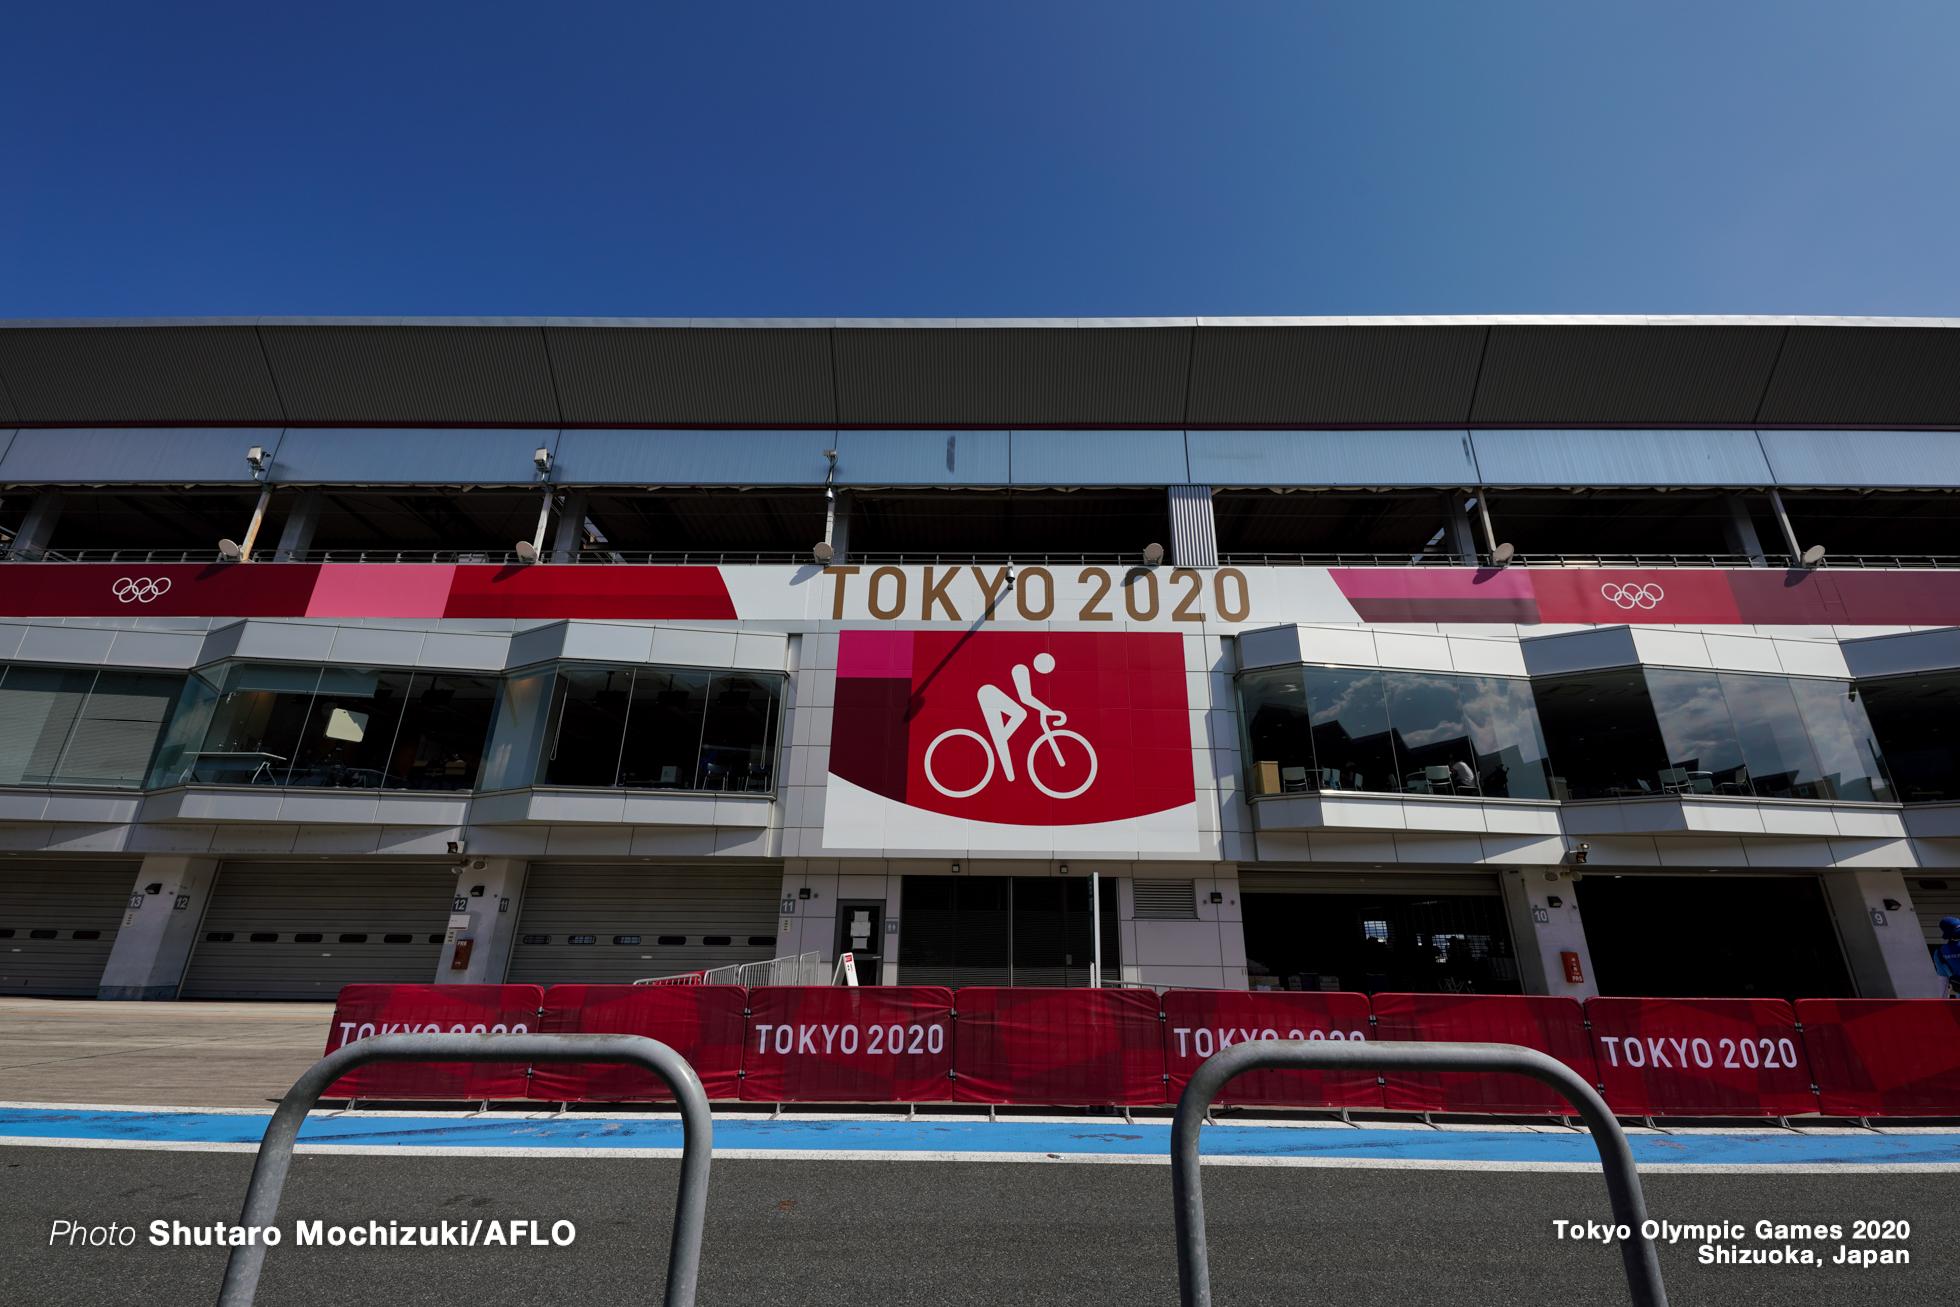 JULY 25, 2021 - Cycling : Women's Road Race during the Tokyo 2020 Olympic Games at the Fuji International Speedway in Shizuoka, Japan. (Photo by Shutaro Mochizuki/AFLO)